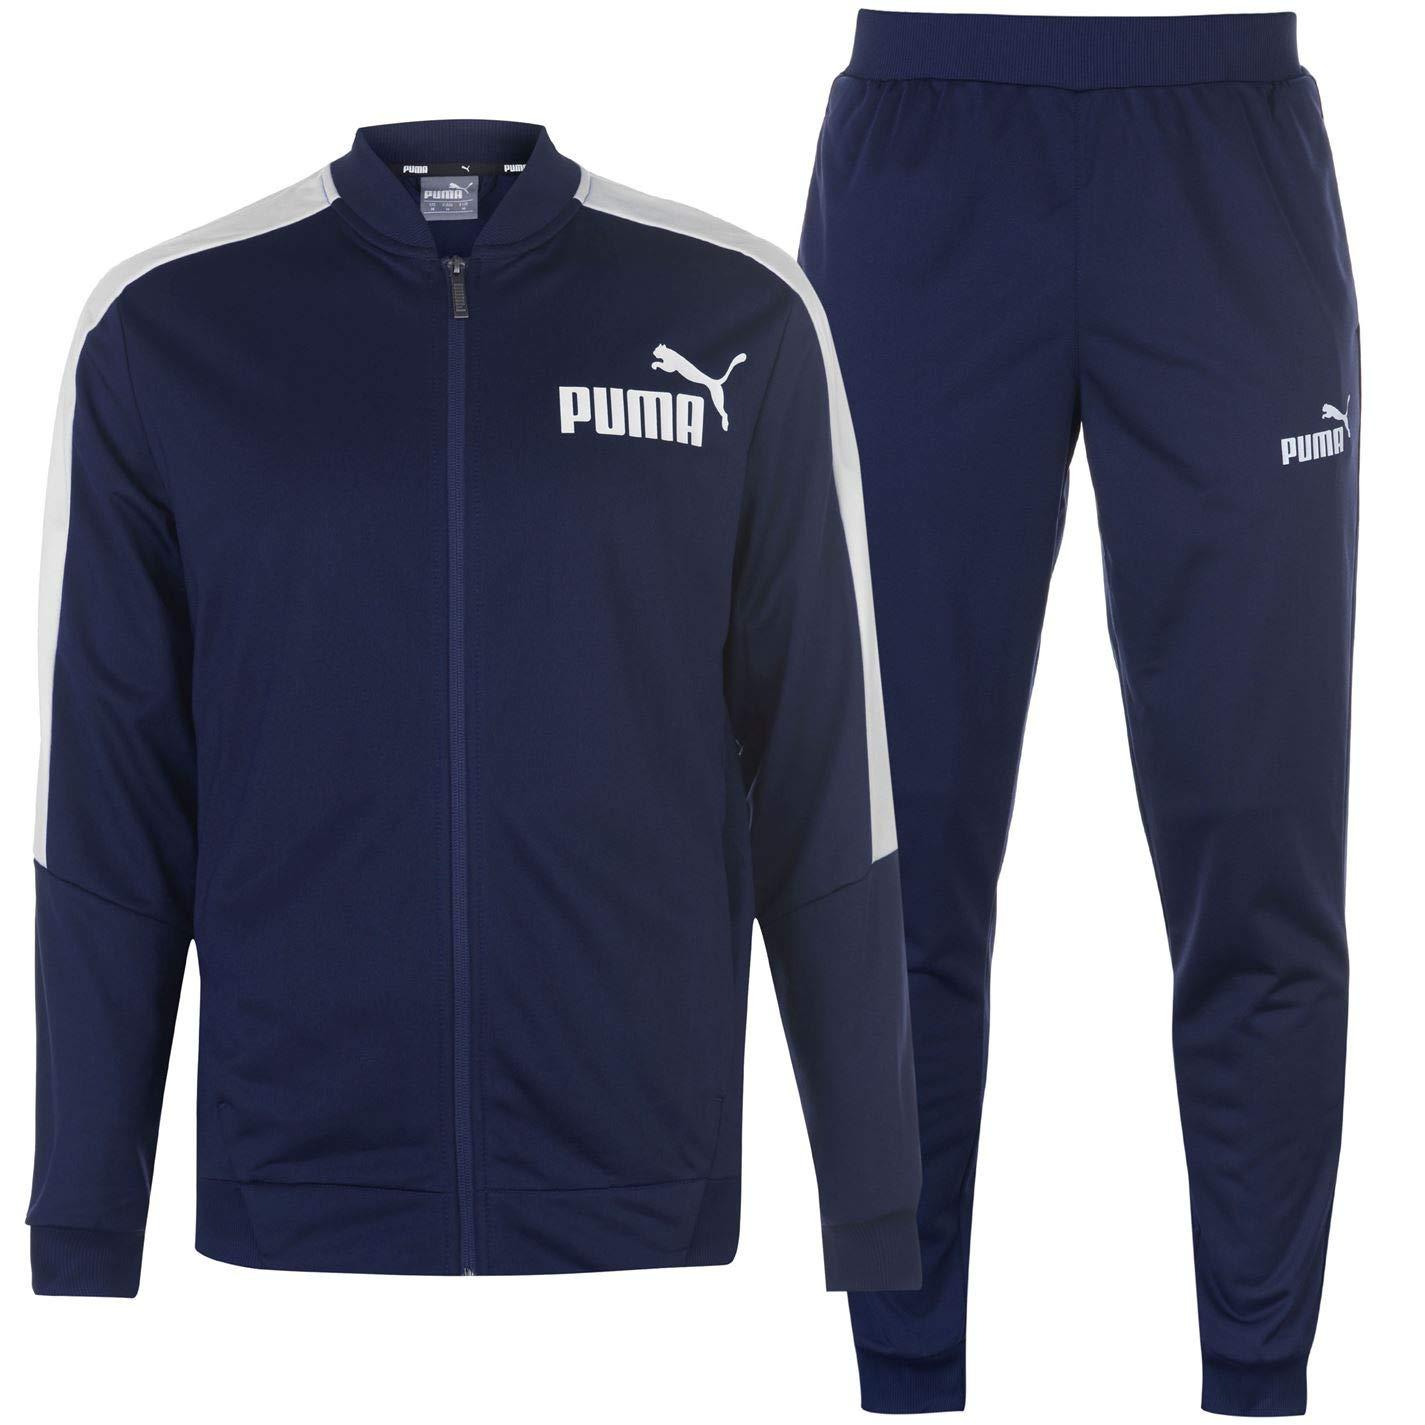 3d441f5eea124 Puma Baseball Tricot Suit CL: Amazon.co.uk: Sports & Outdoors